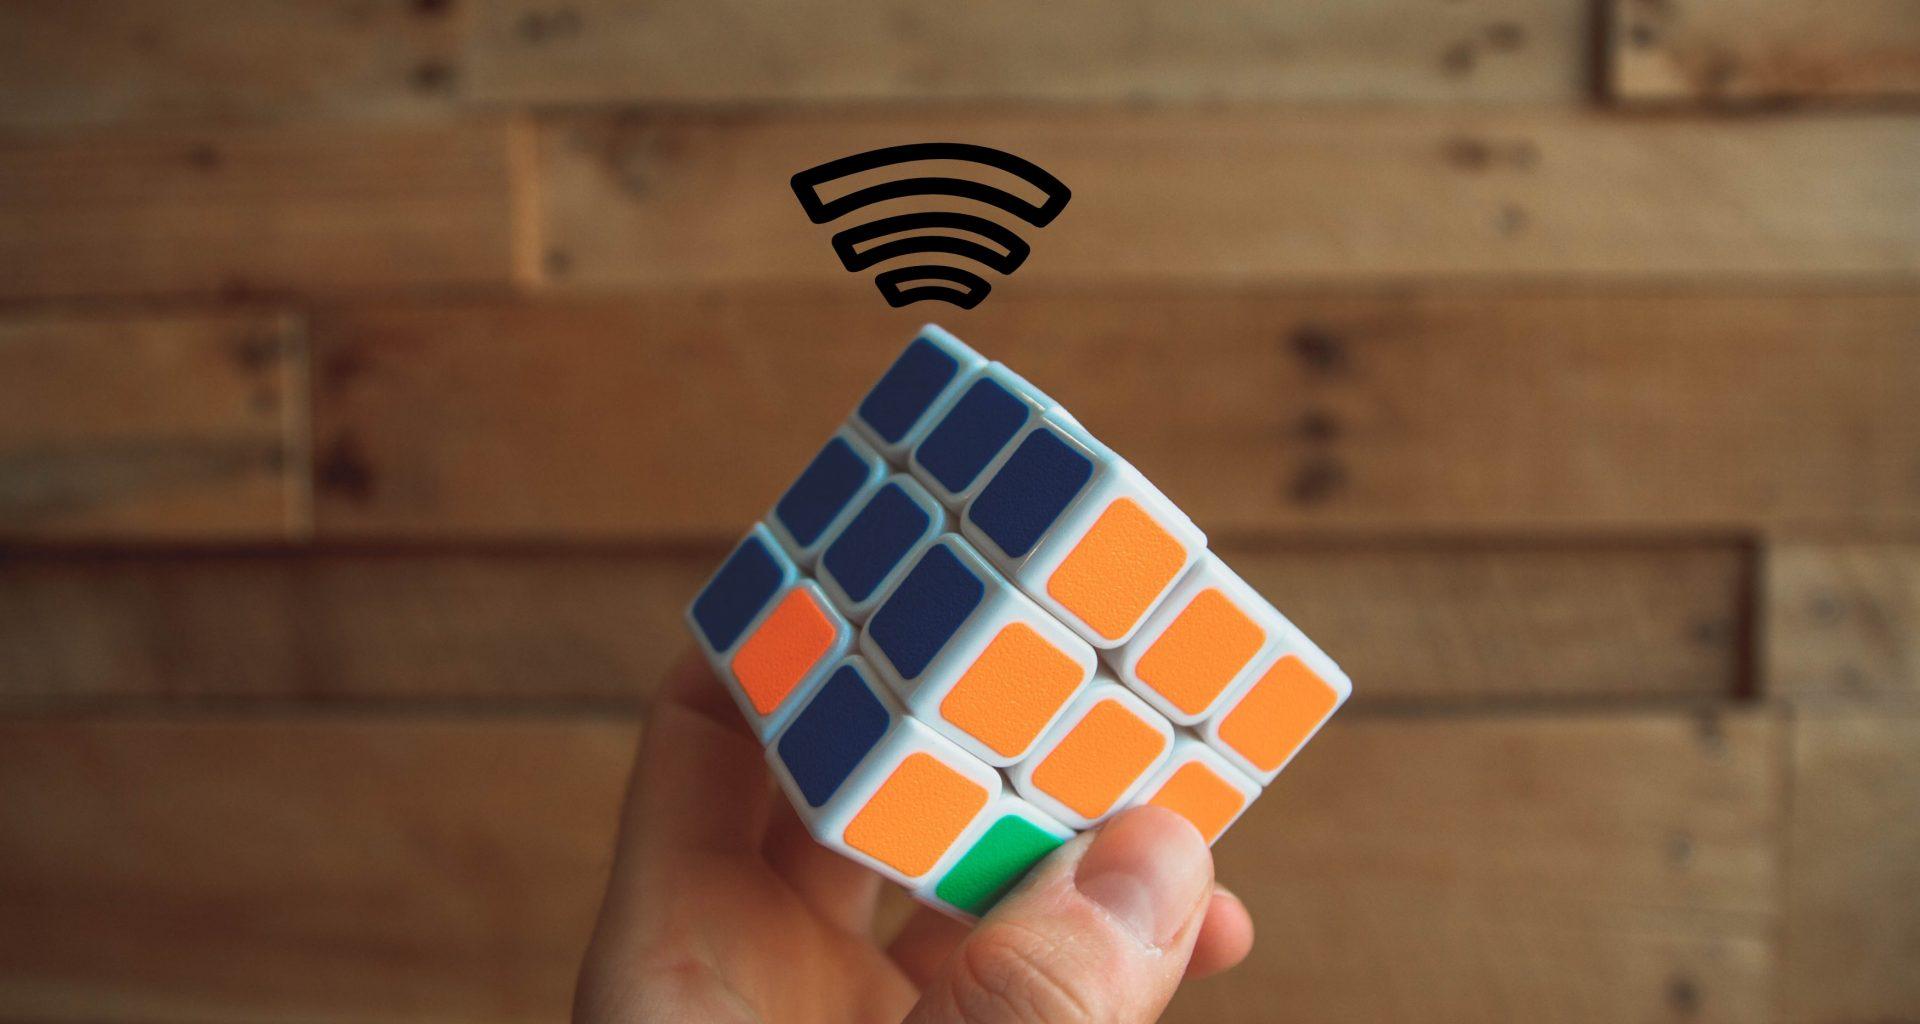 cnctdwifi rubix cube